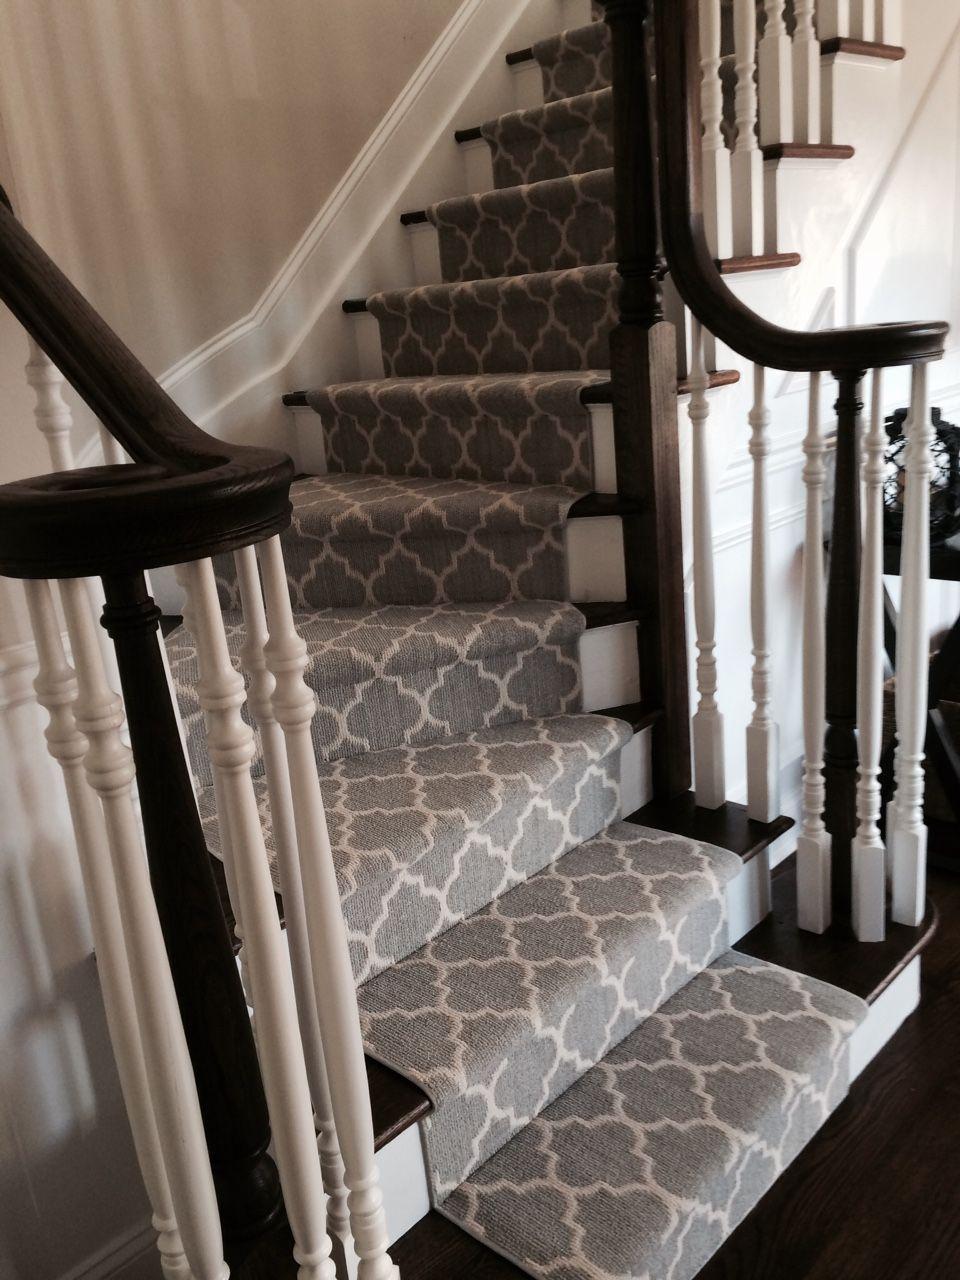 Taza Z6876 00758 Carpet Flooring Anderson Tuftex Stair | Designer Carpet For Stairs | Stair Railing | Victorian | Flower Design | Treads | American Style